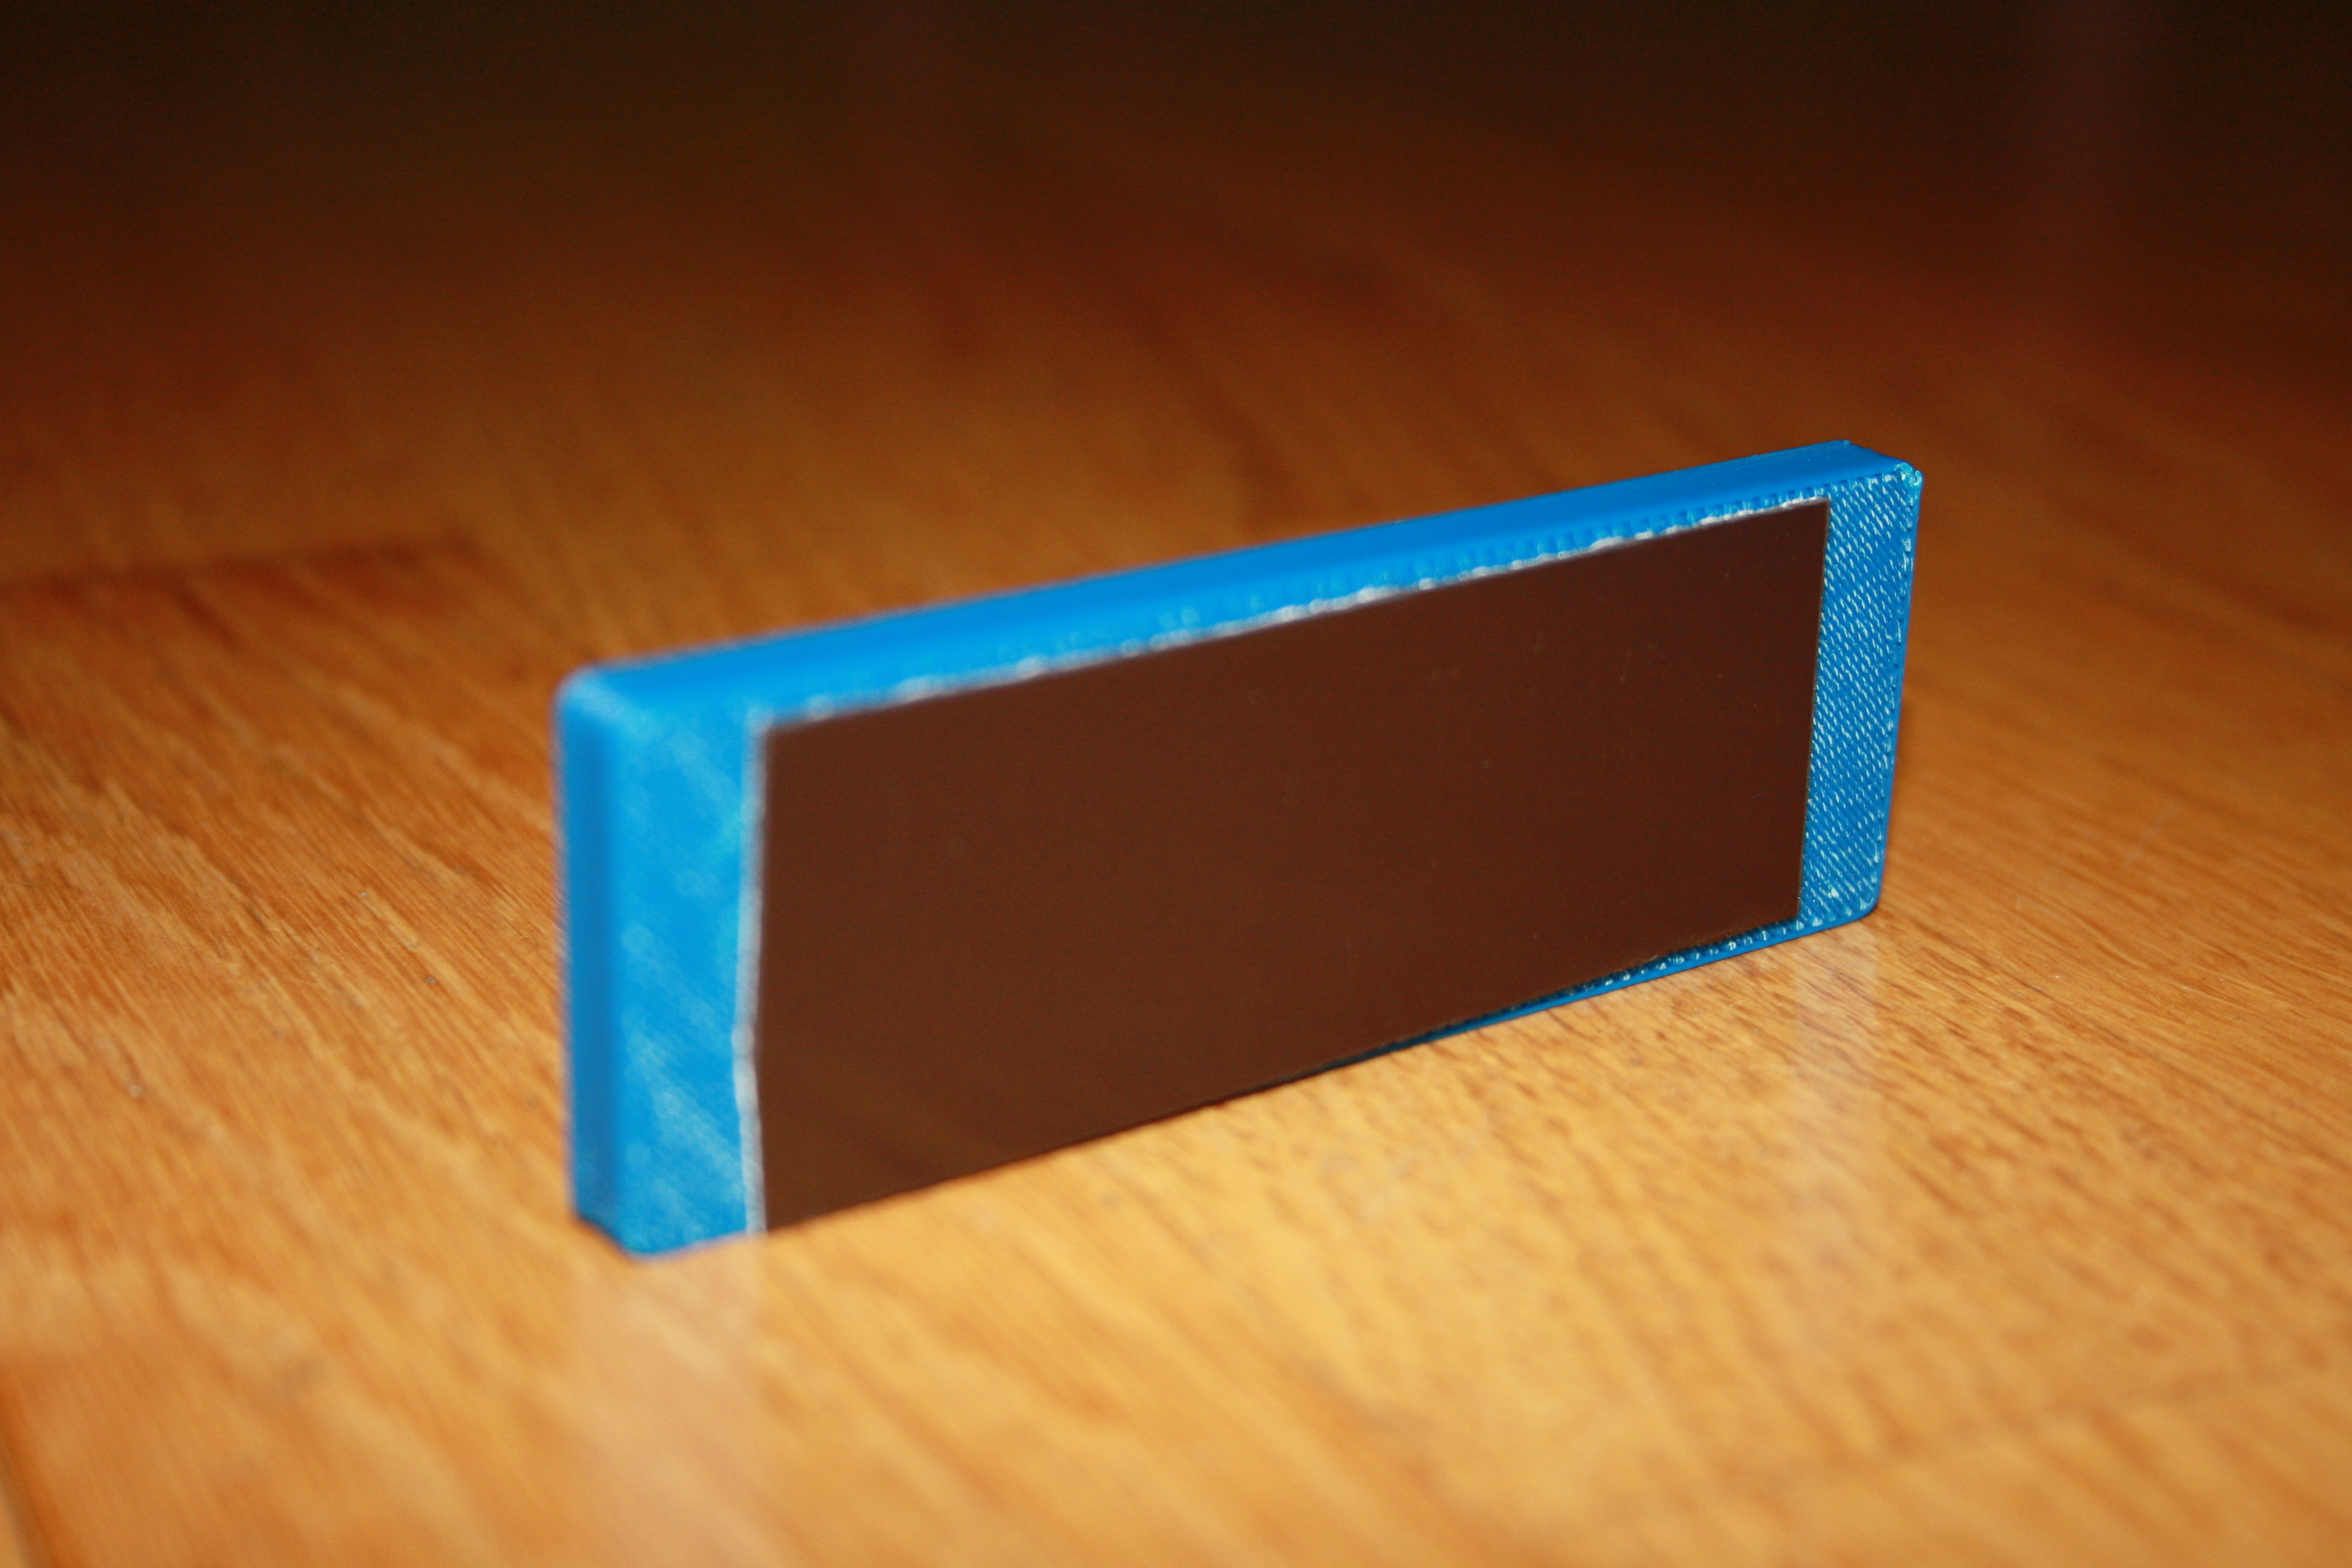 panneaux_016.JPG Download STL file Magnet station de métro • 3D print design, JJB